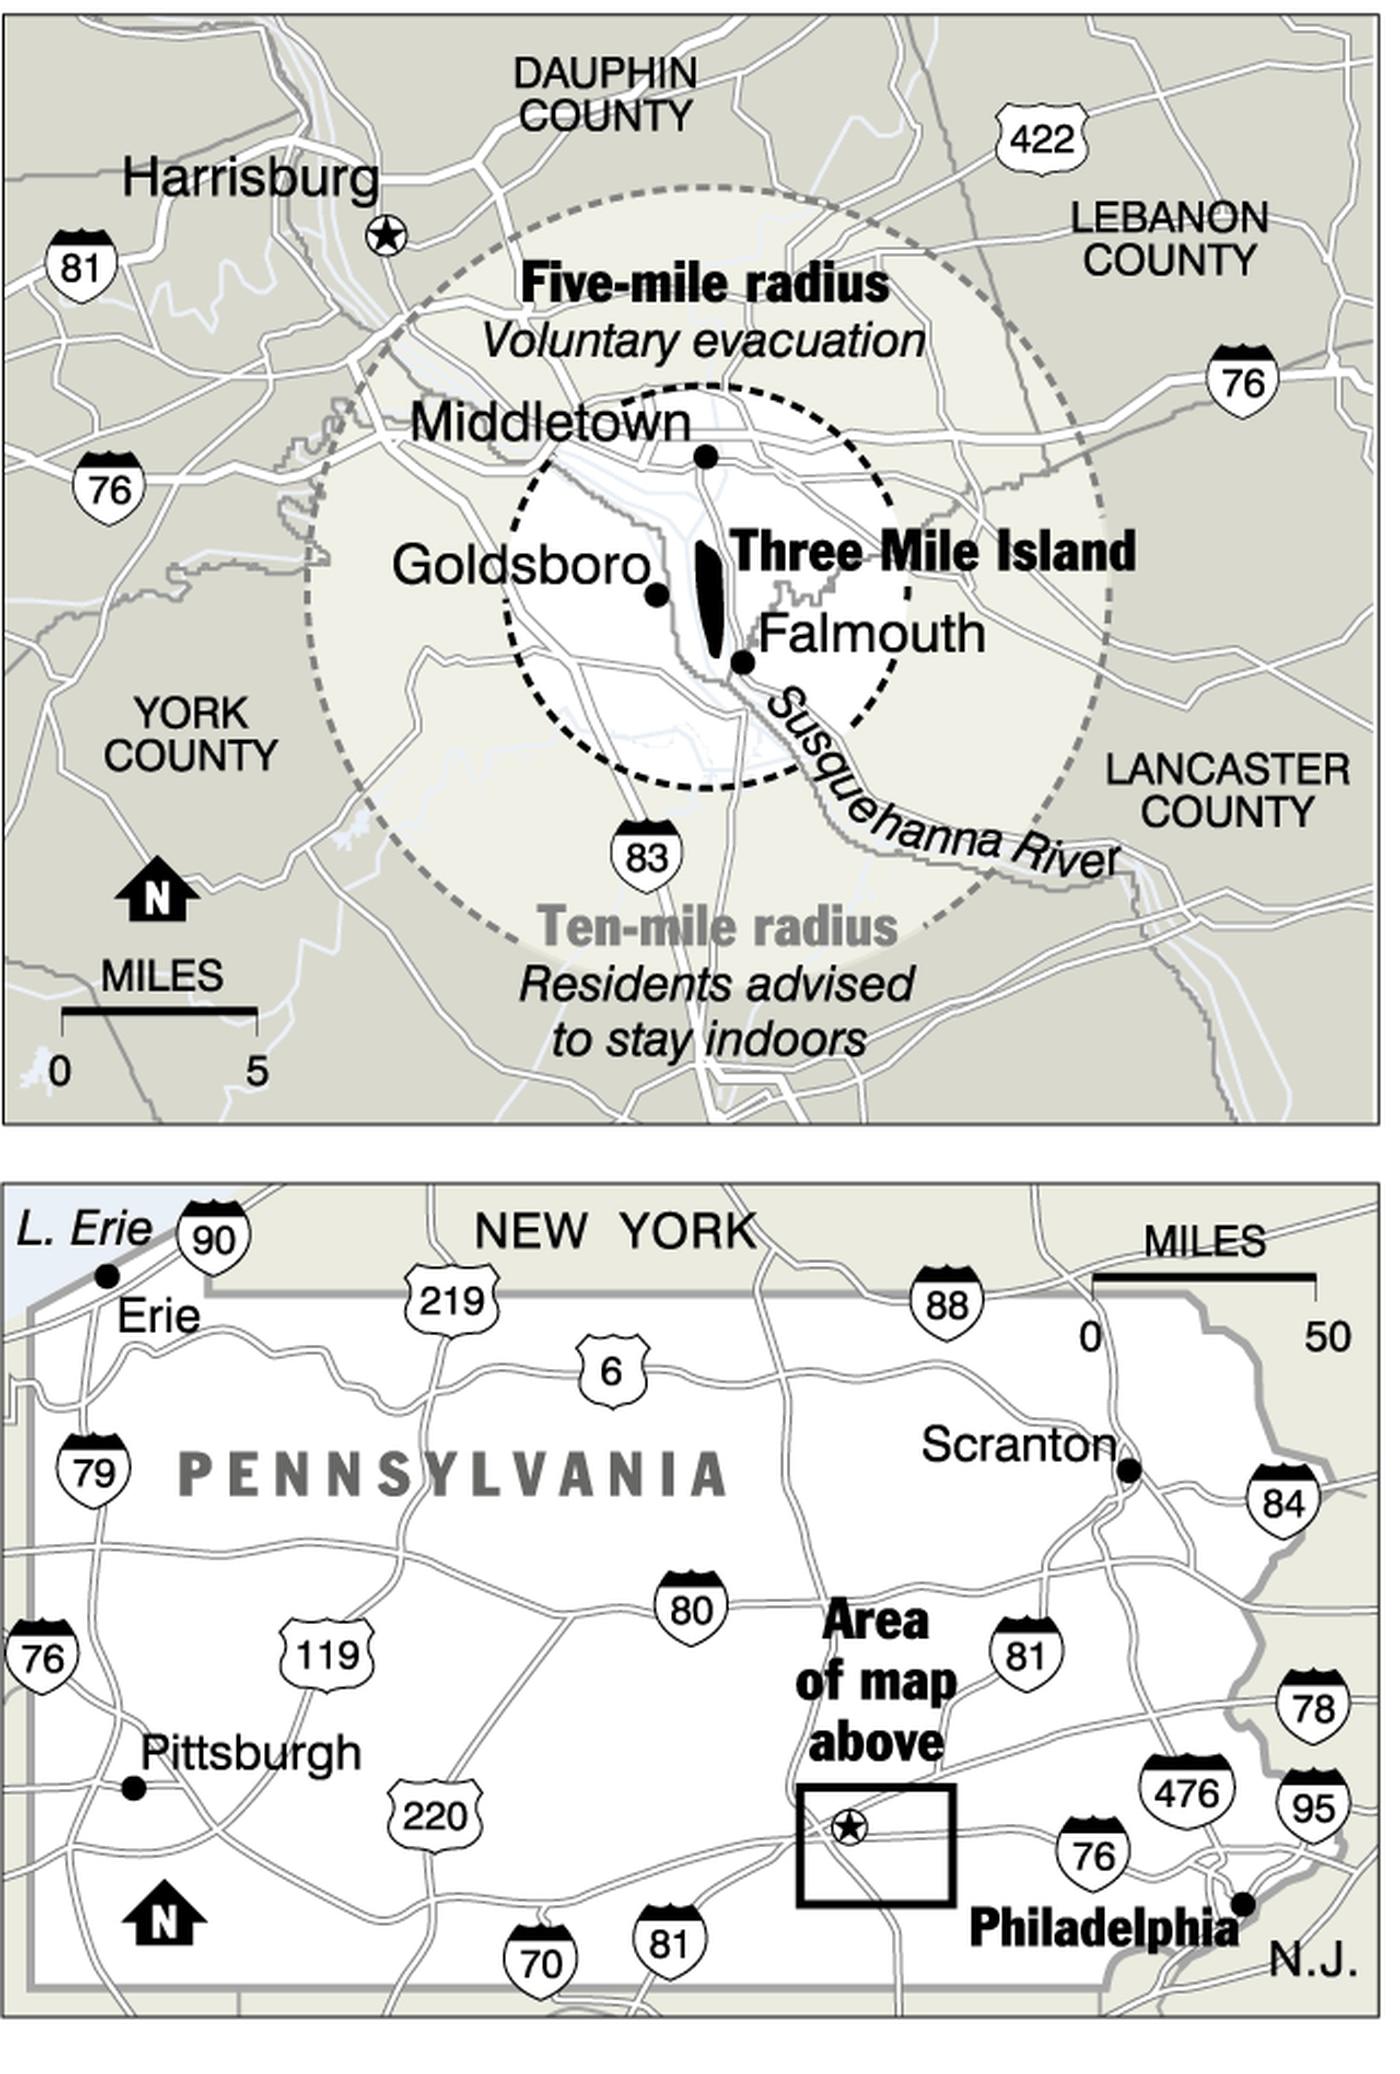 Infamous Three Mile Island reactor, shut down since 1979